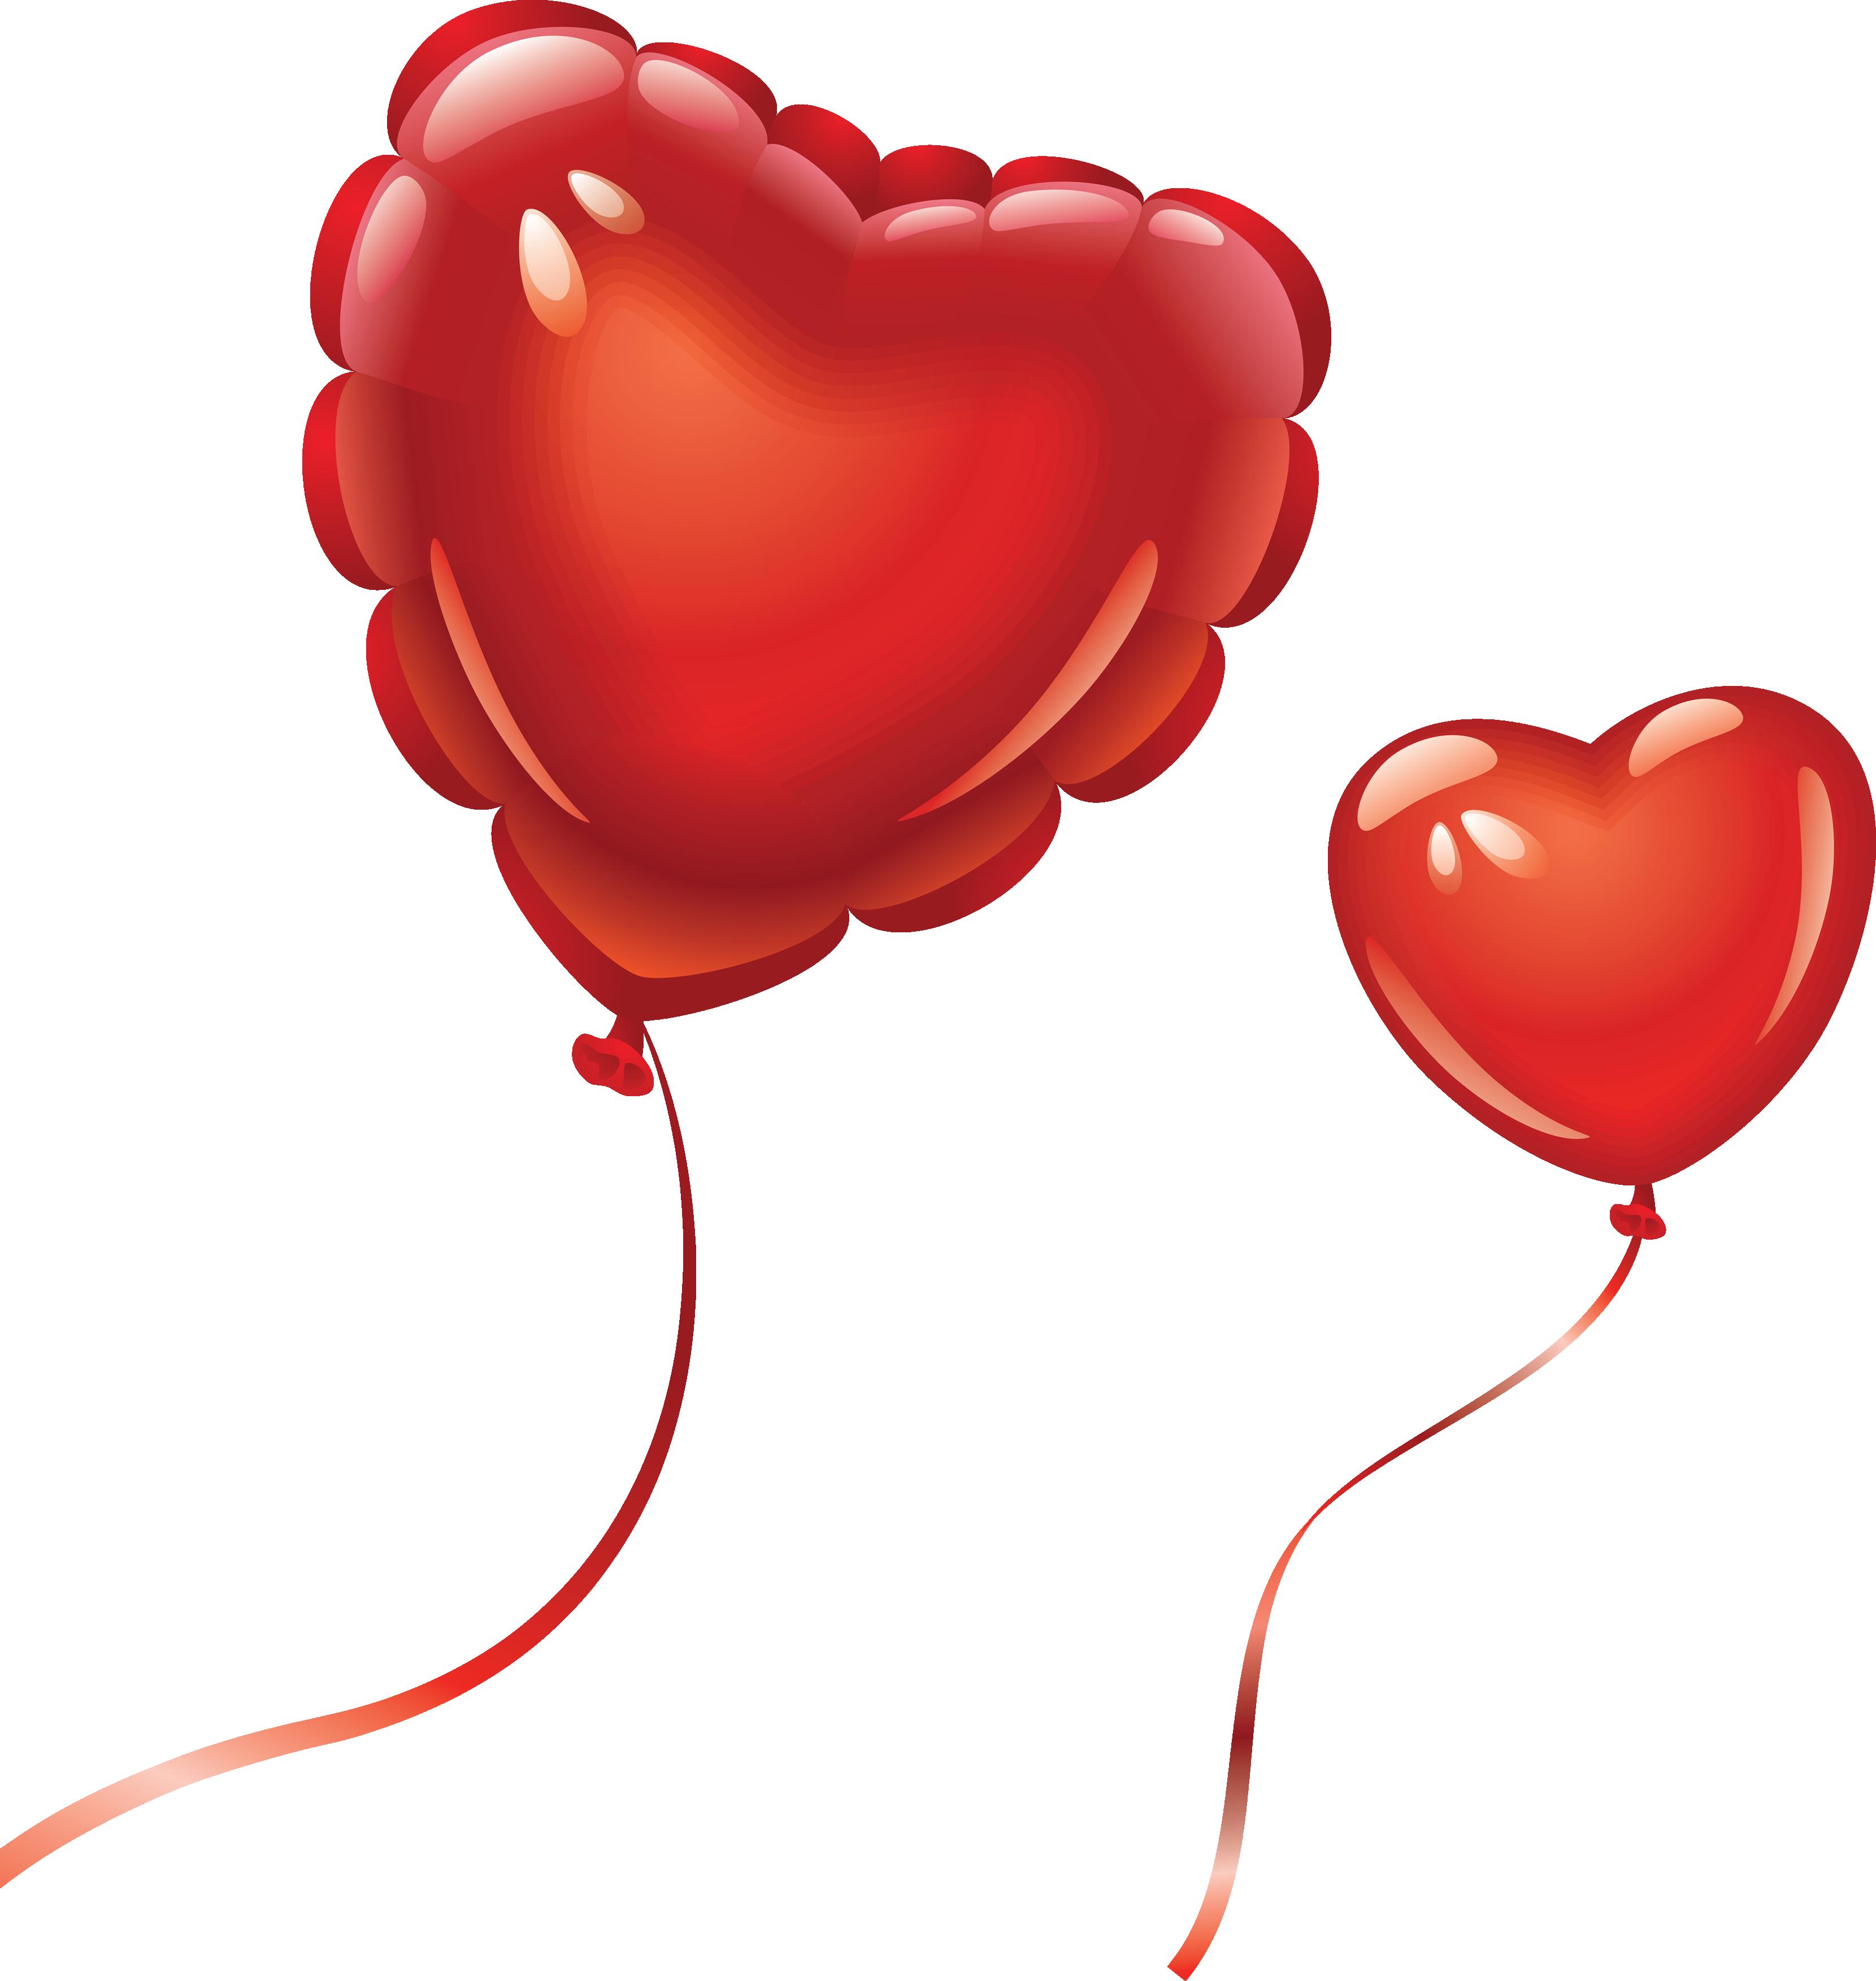 Heart balloon clipart clipart kid - How to make heart balloon ...